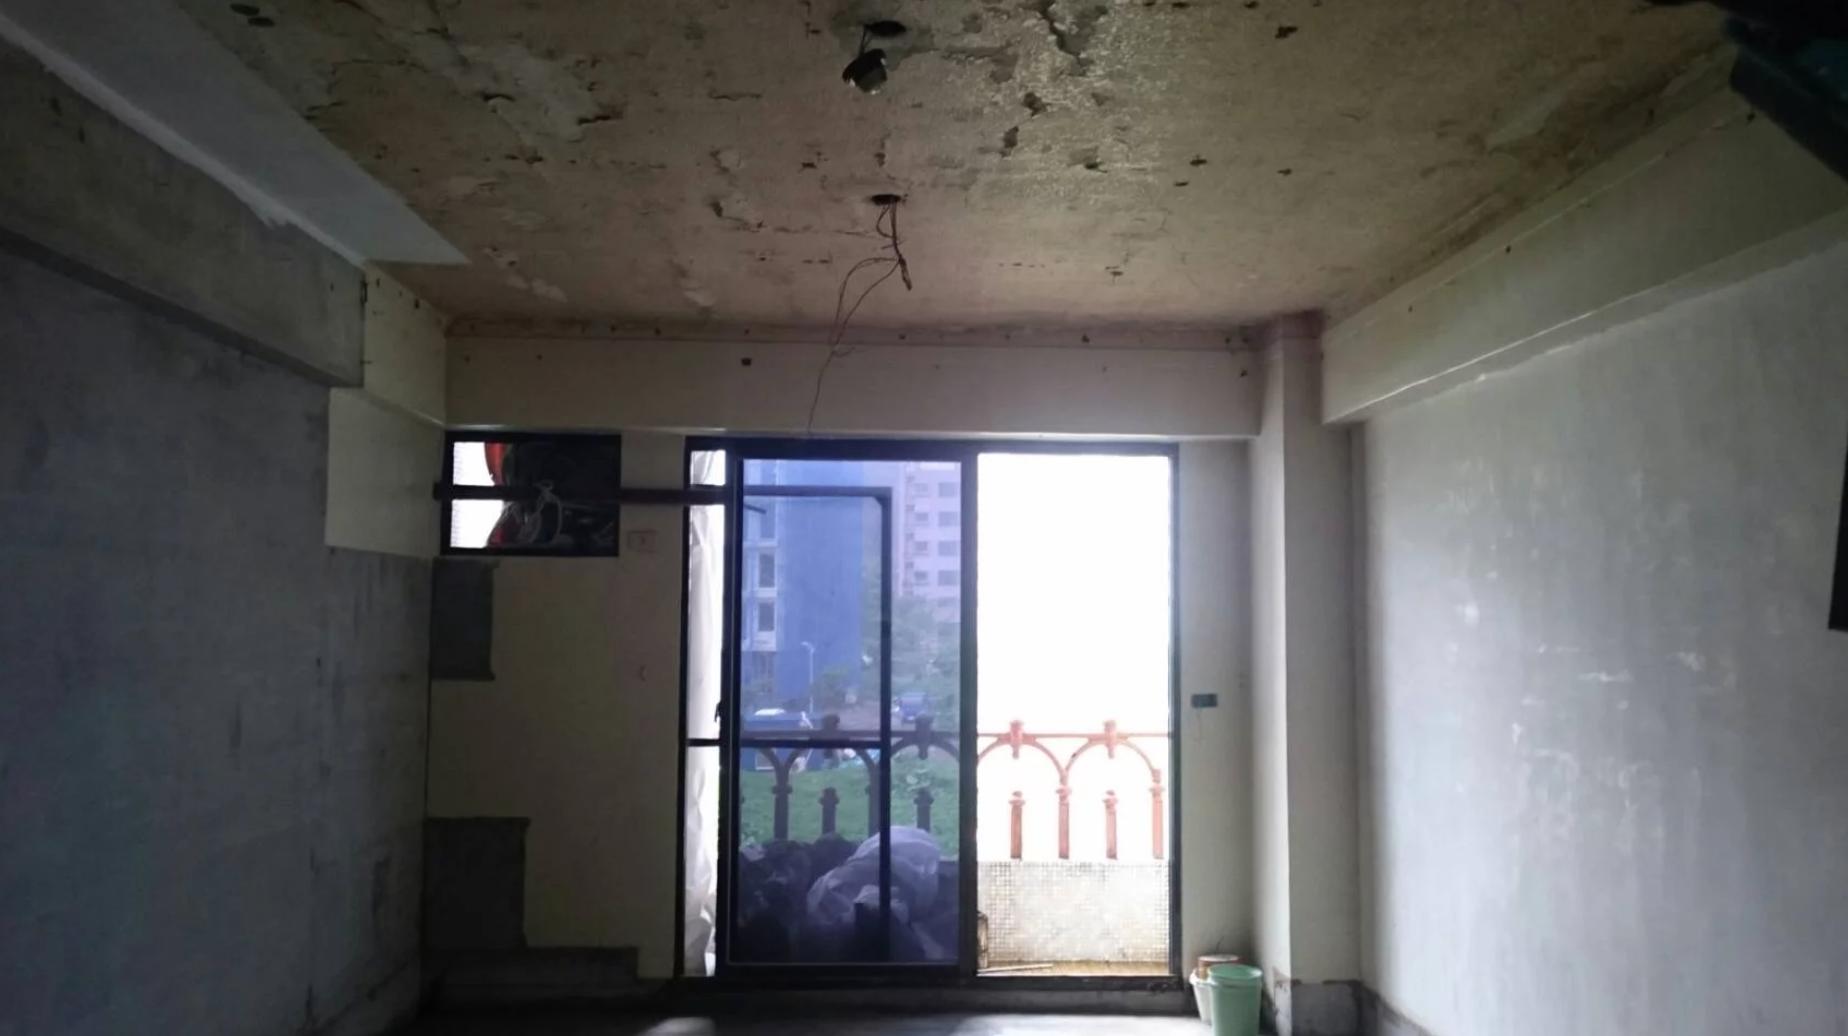 德築-DEZU-project-礁溪套房裝修-architecture-interior-renovation-1